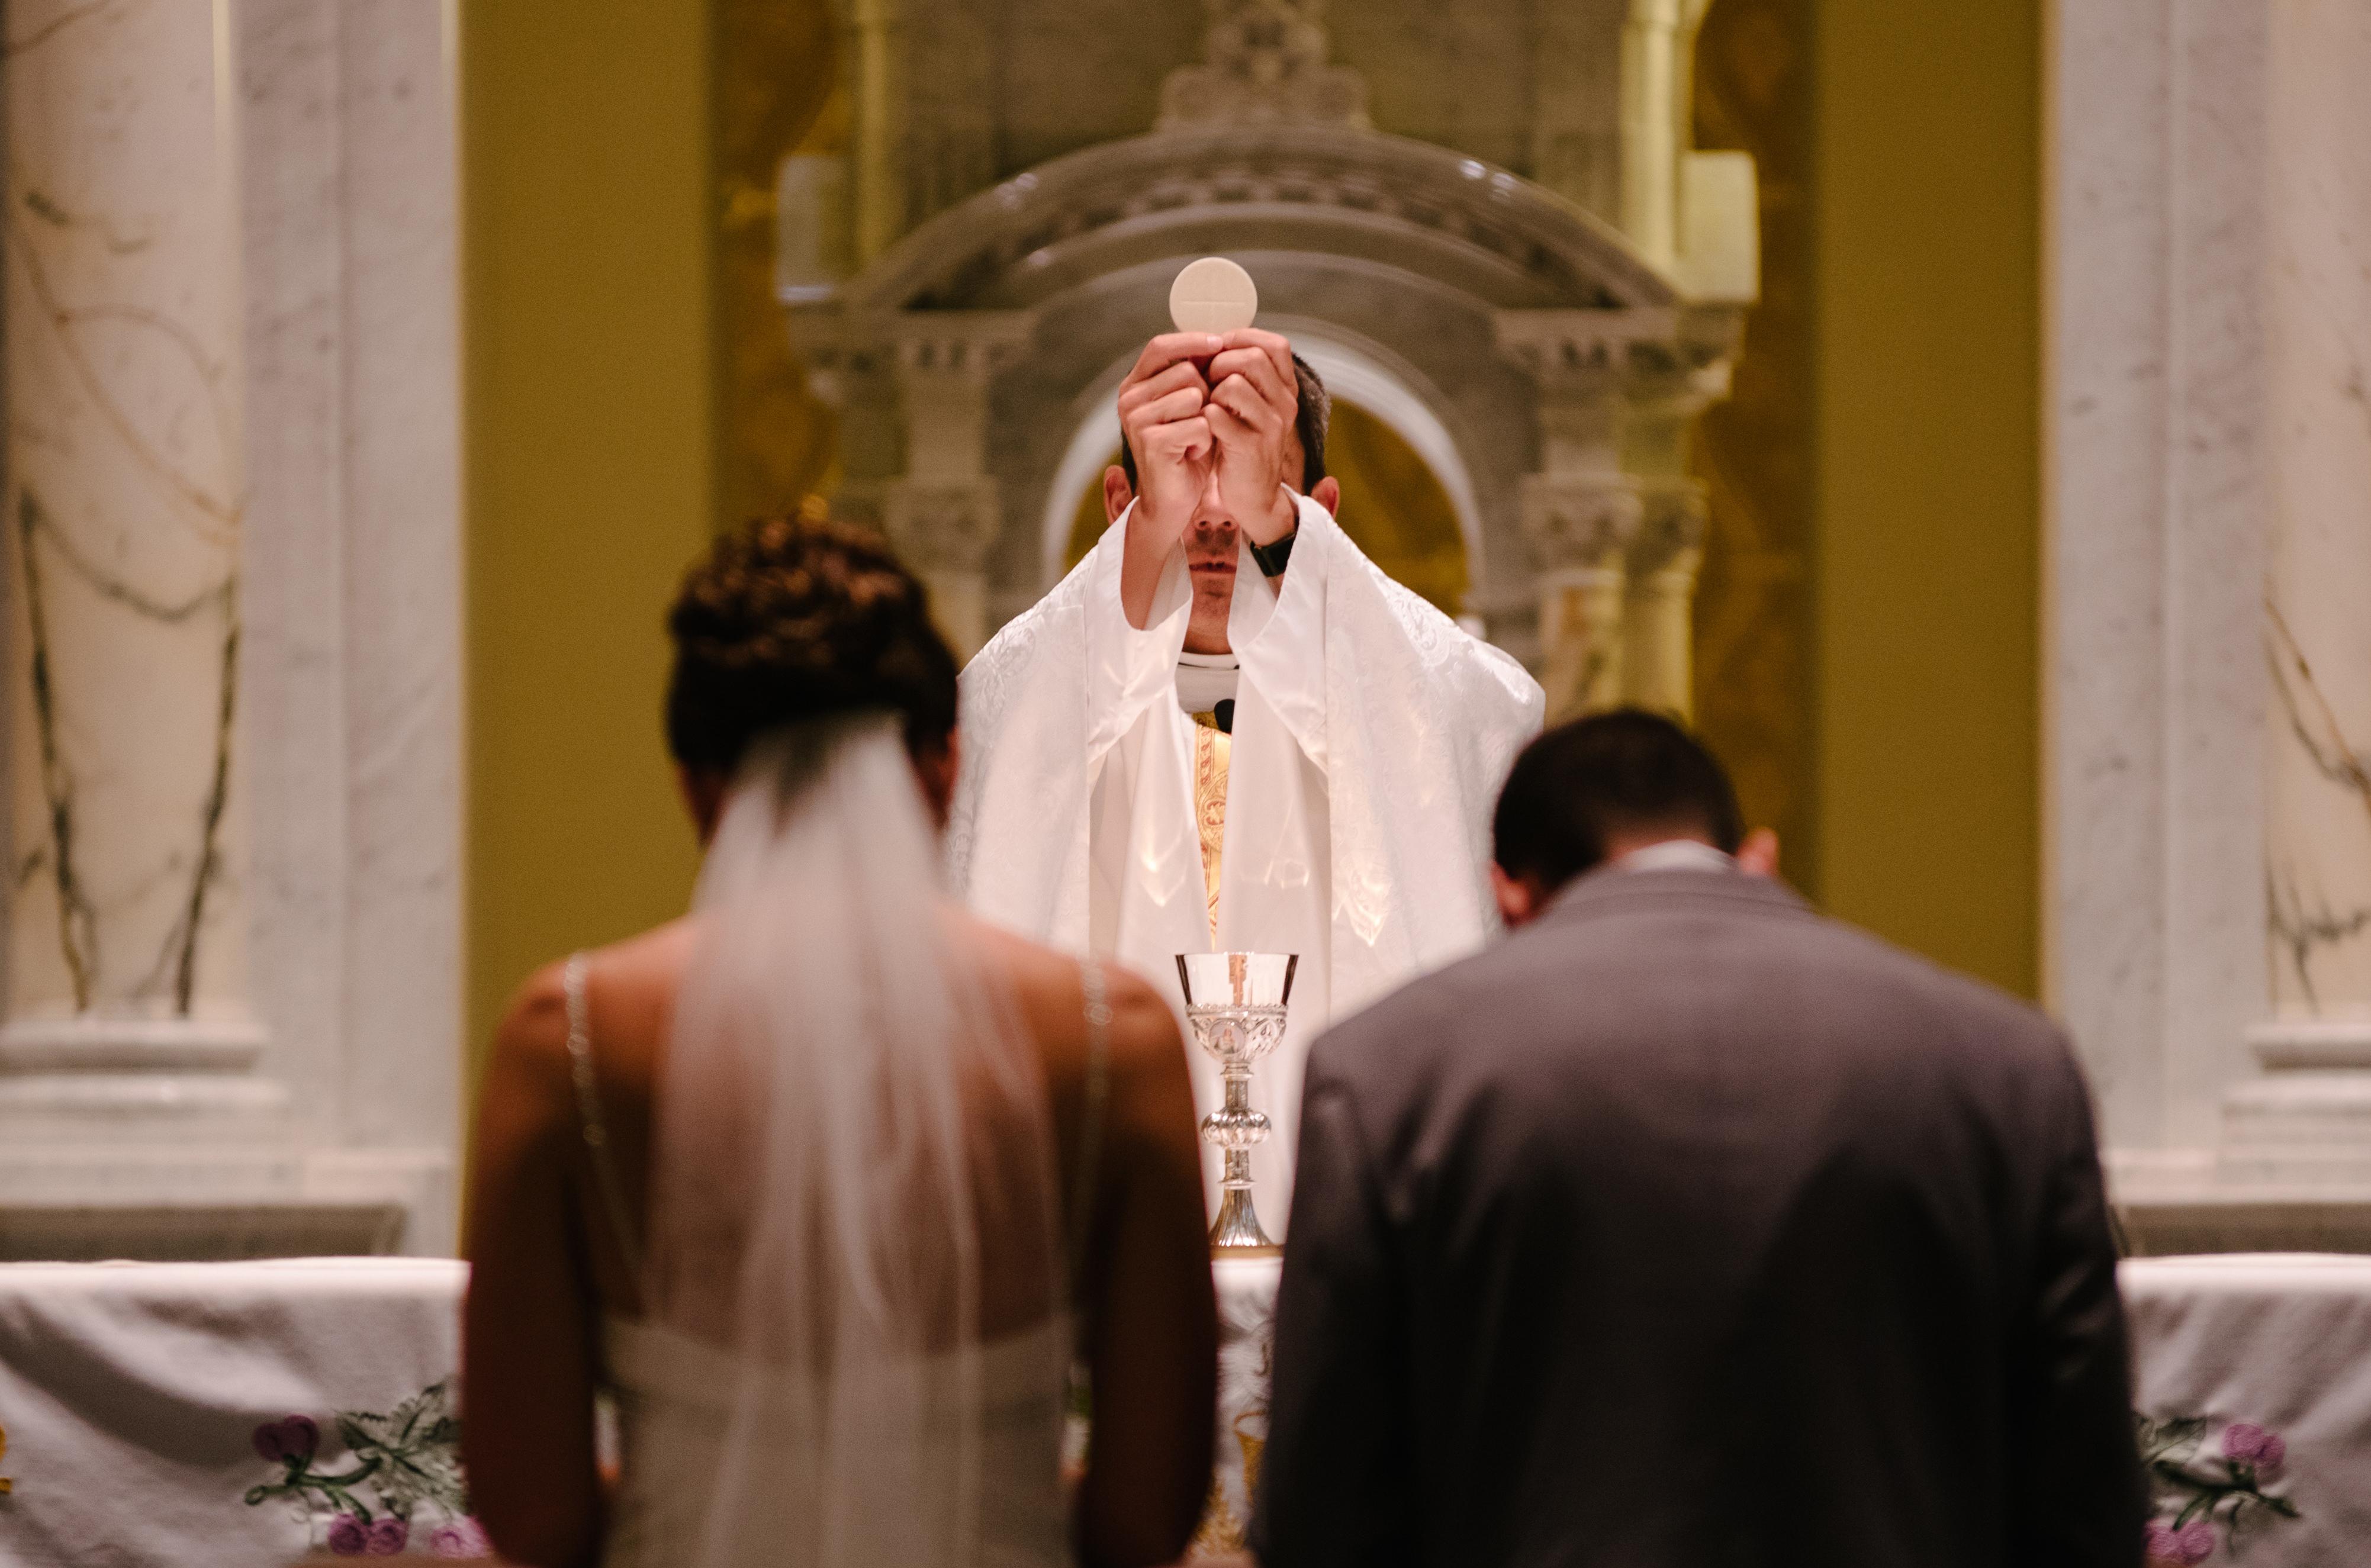 Matrimonio Mujer Musulmana Hombre Catolico : German bishops prepare communion rules for mixed